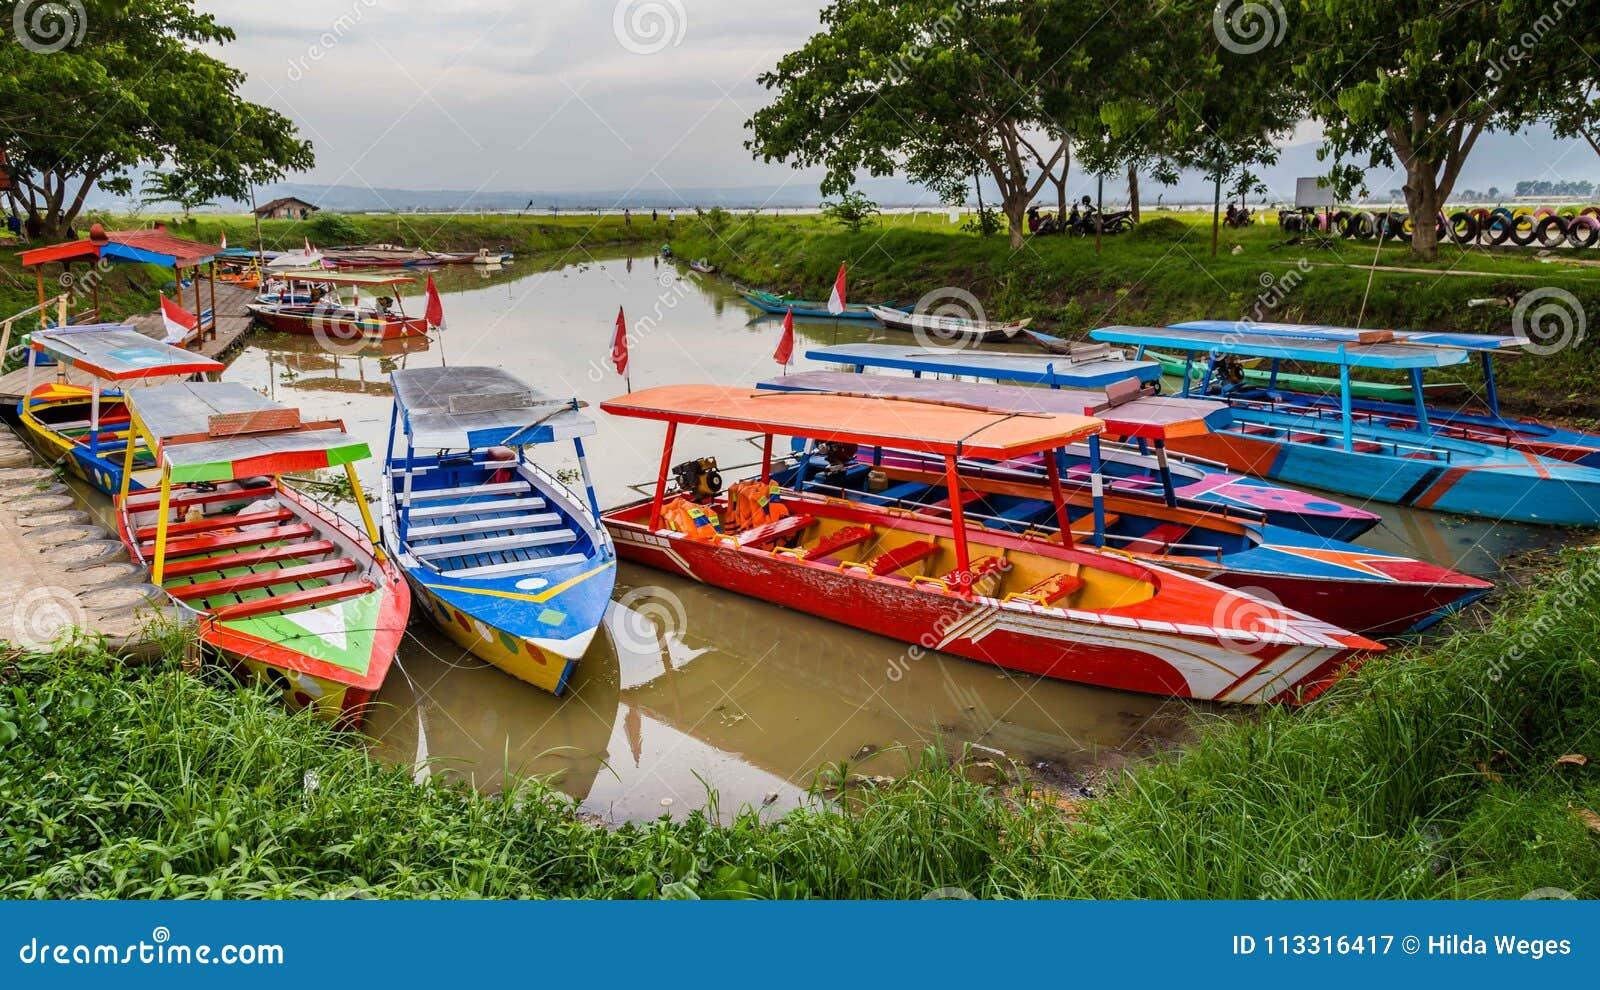 Rawapening, Semarang, центральная Ява, Индонезия